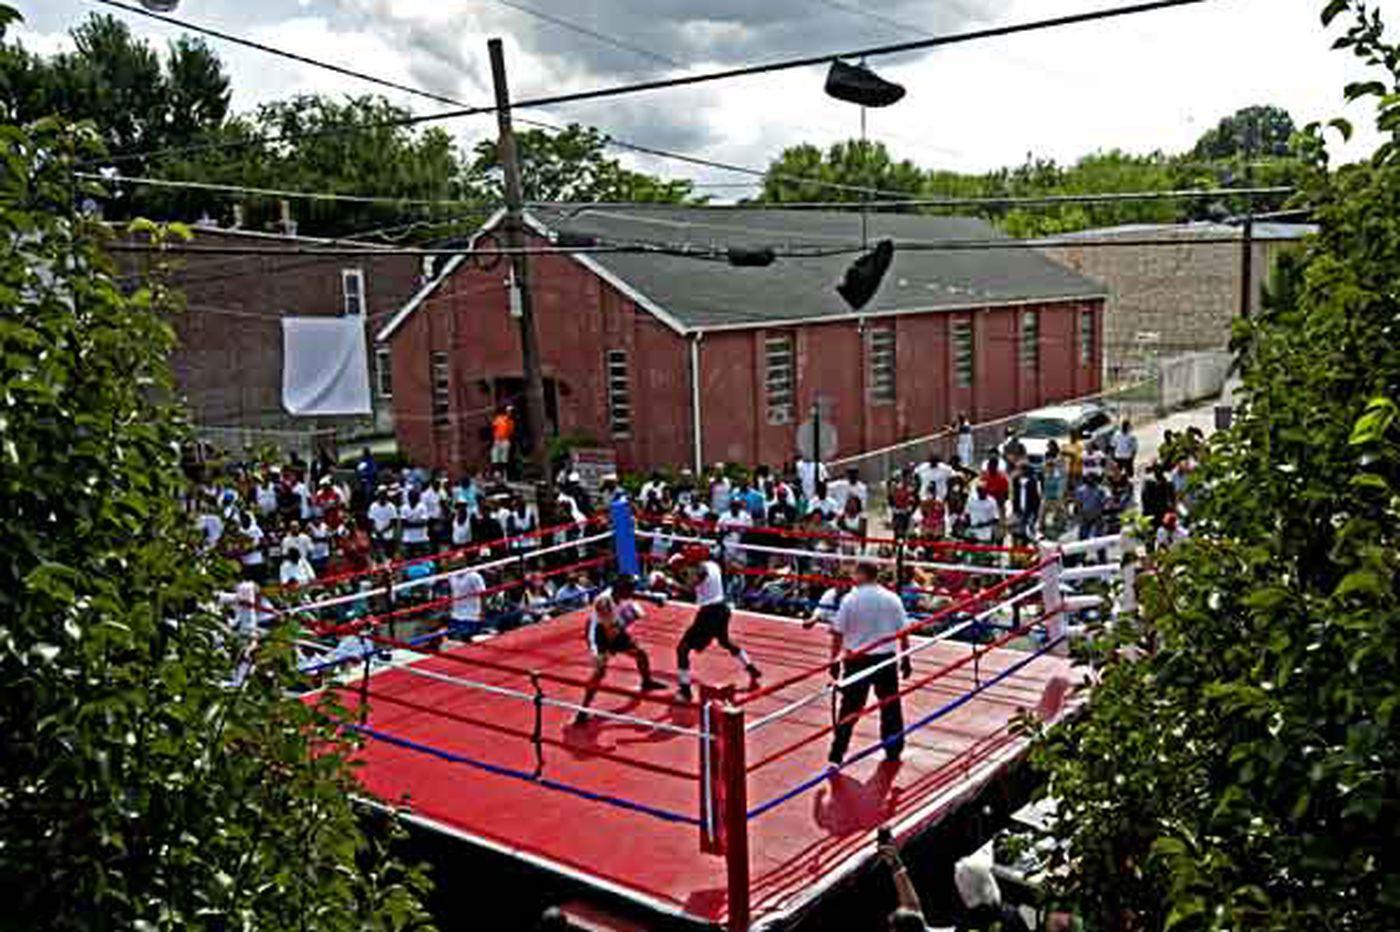 Camden boxing gym still awaits repairs